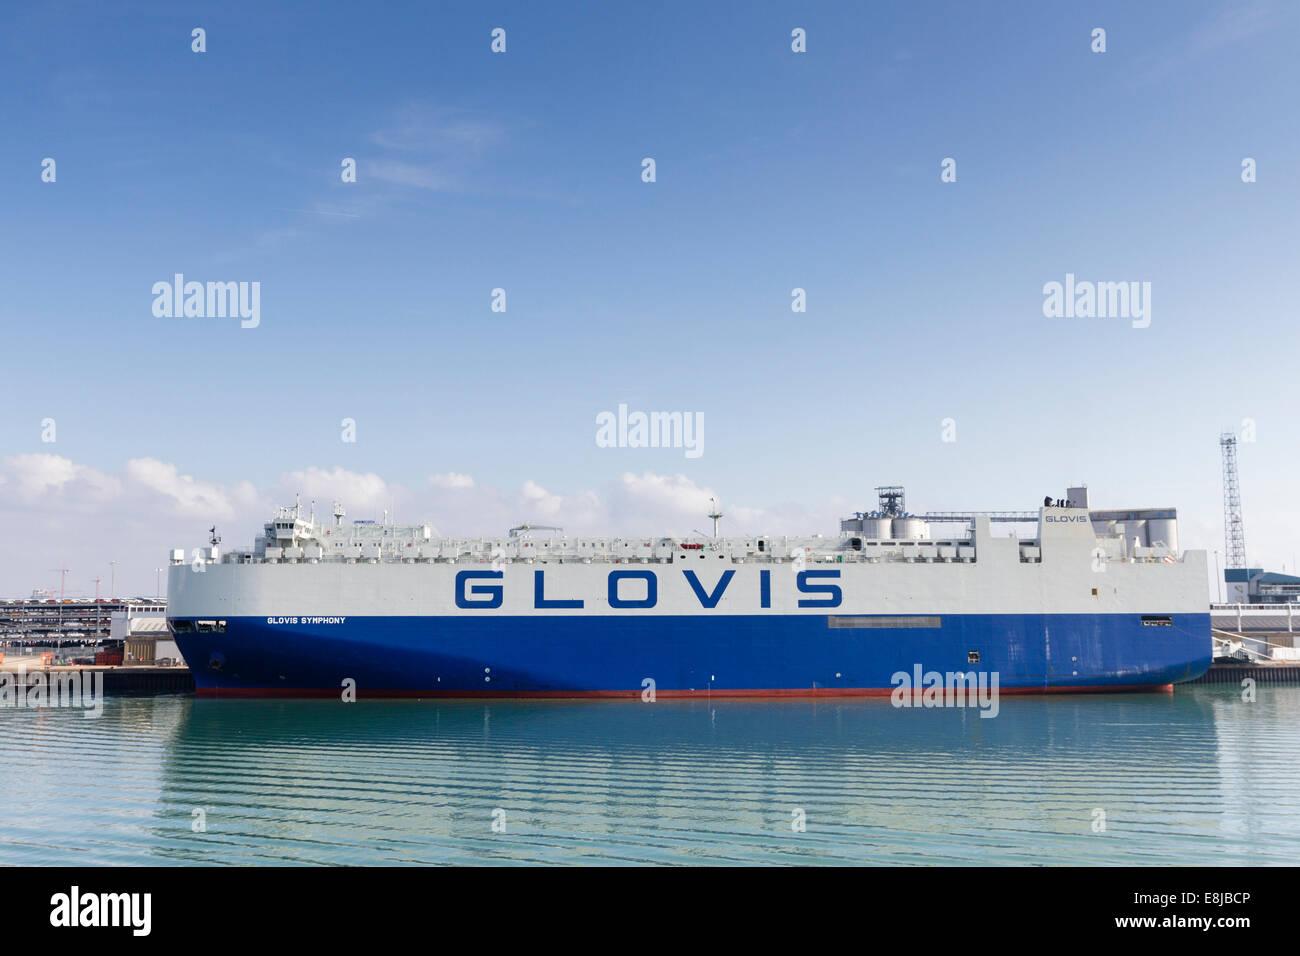 Glovis Symphony car carrier, shipping company, Southampton docks, England, UK - Stock Image